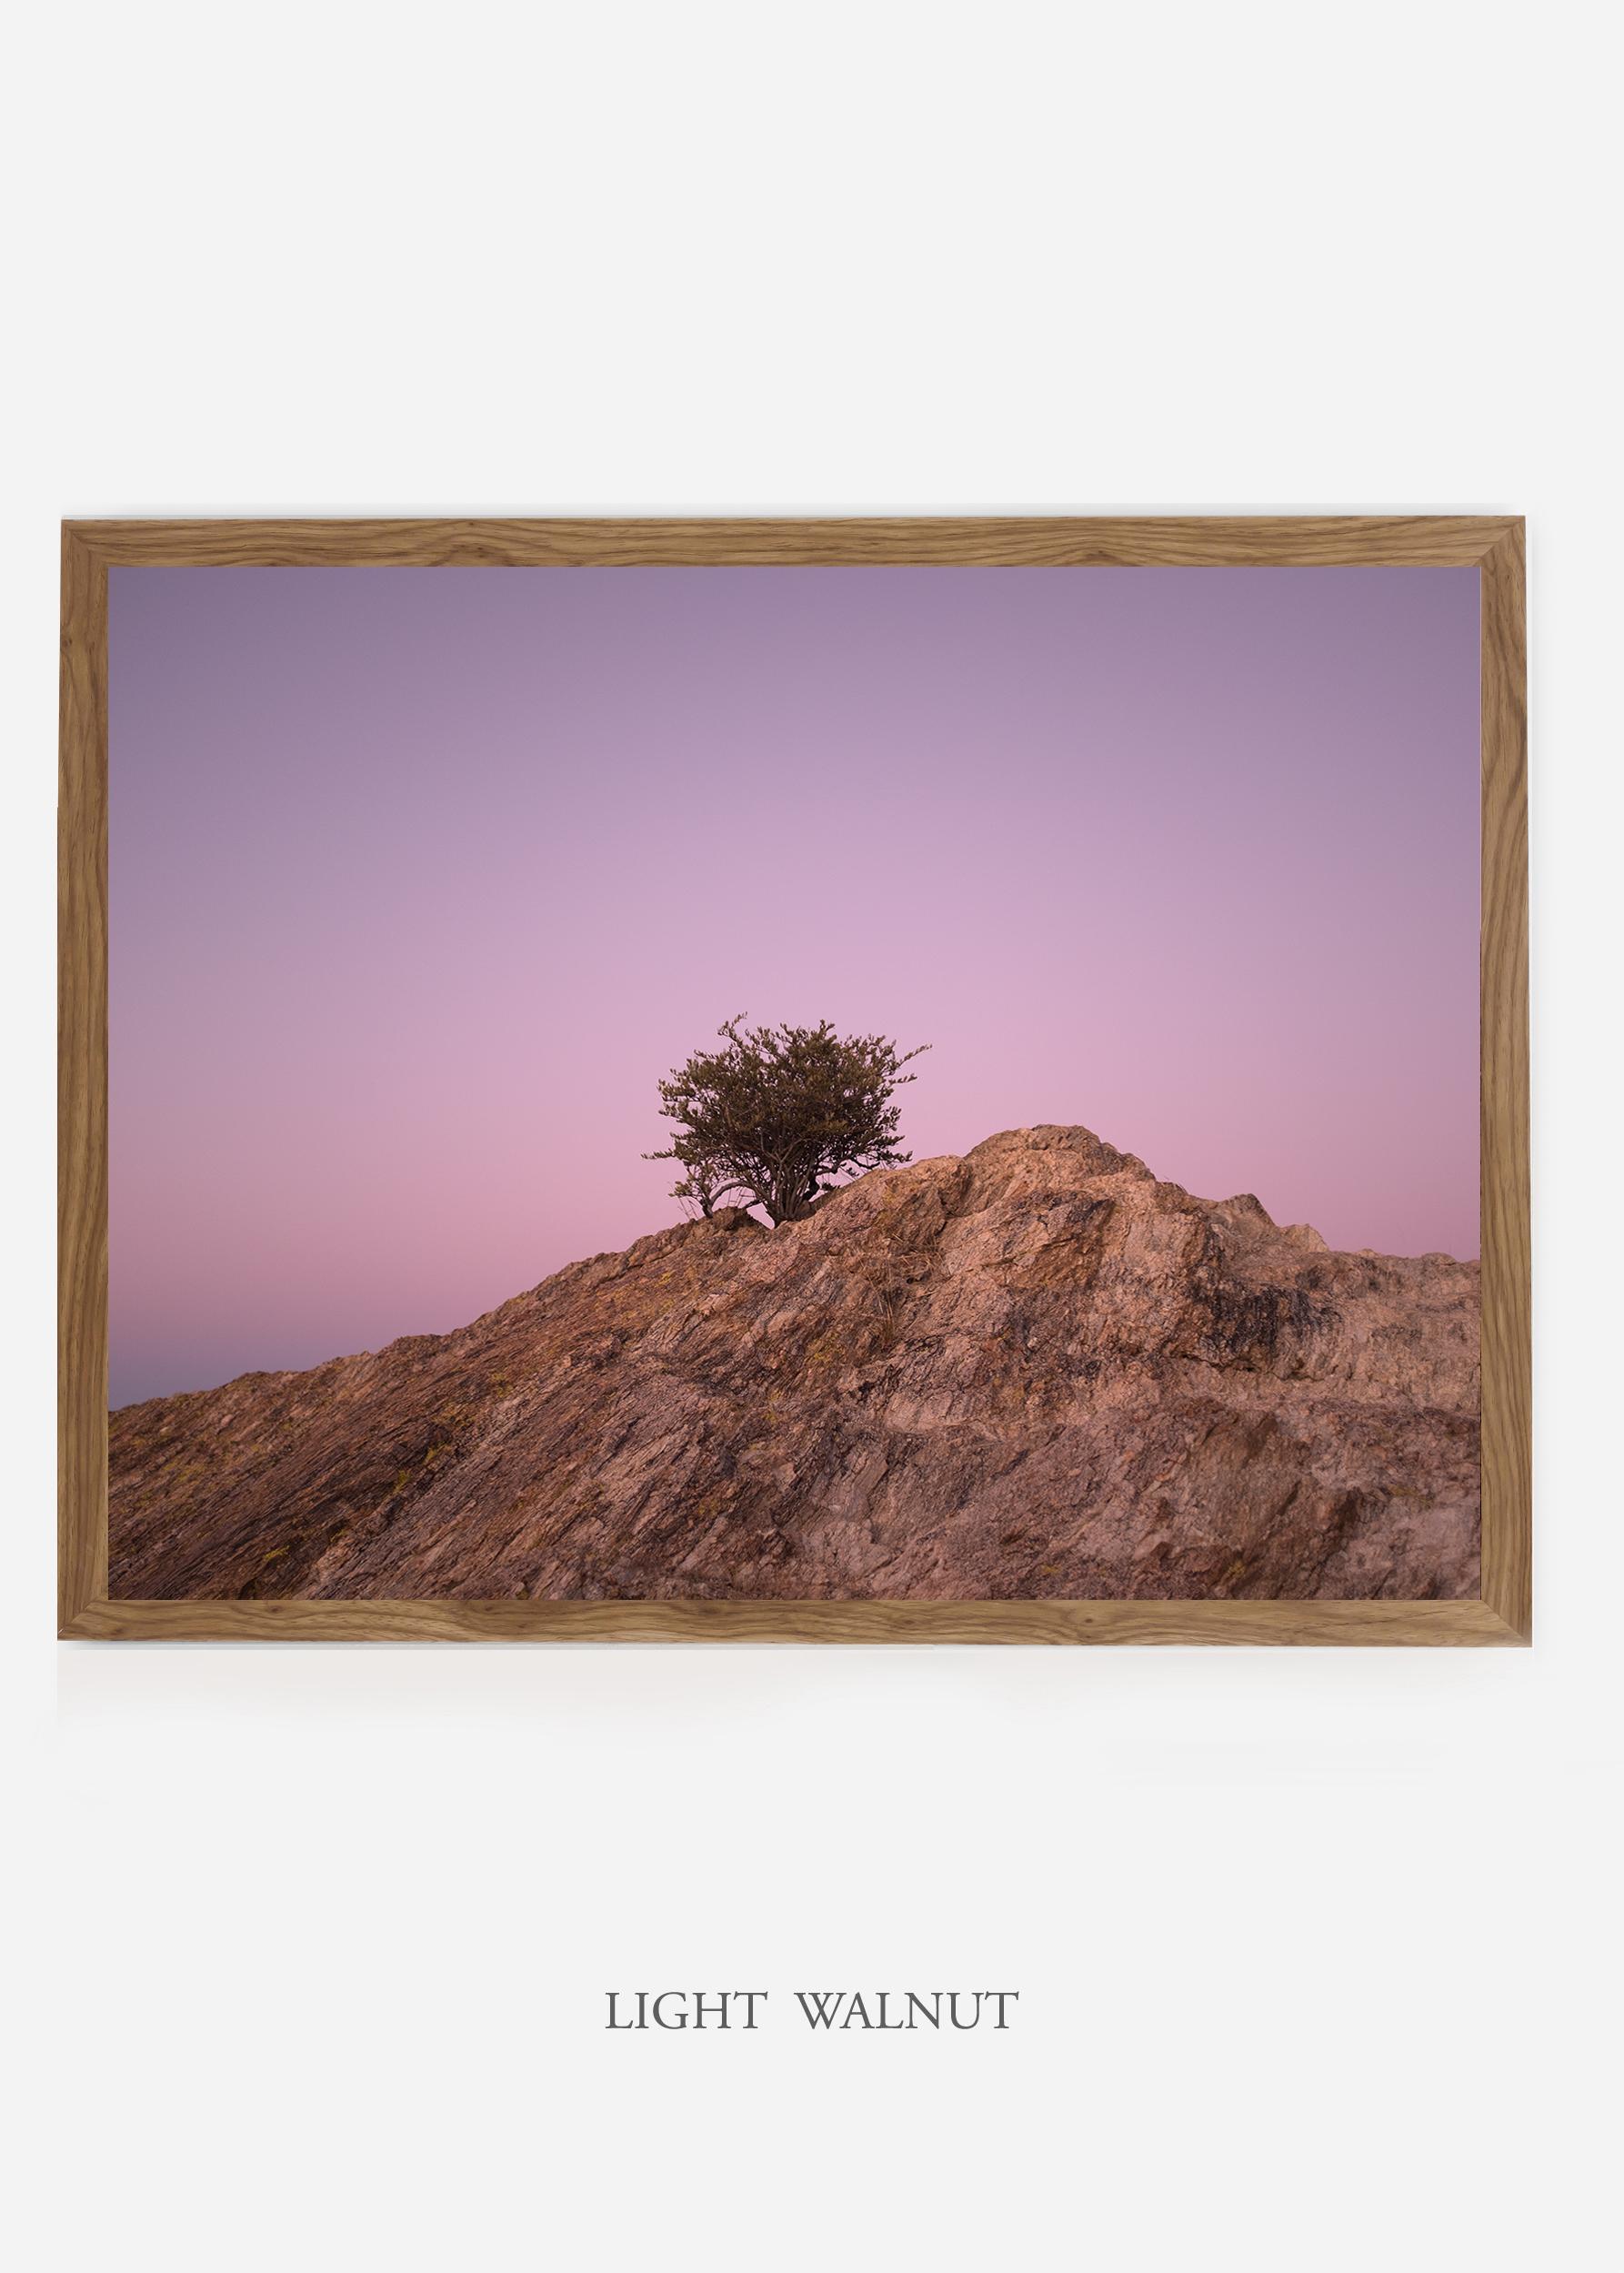 nomat_lightwalnutframe-saguaroNo.11-wildercalifornia-art-wallart-cactusprint-homedecor-prints-arizona-botanical-artwork-interiordesign.jpg